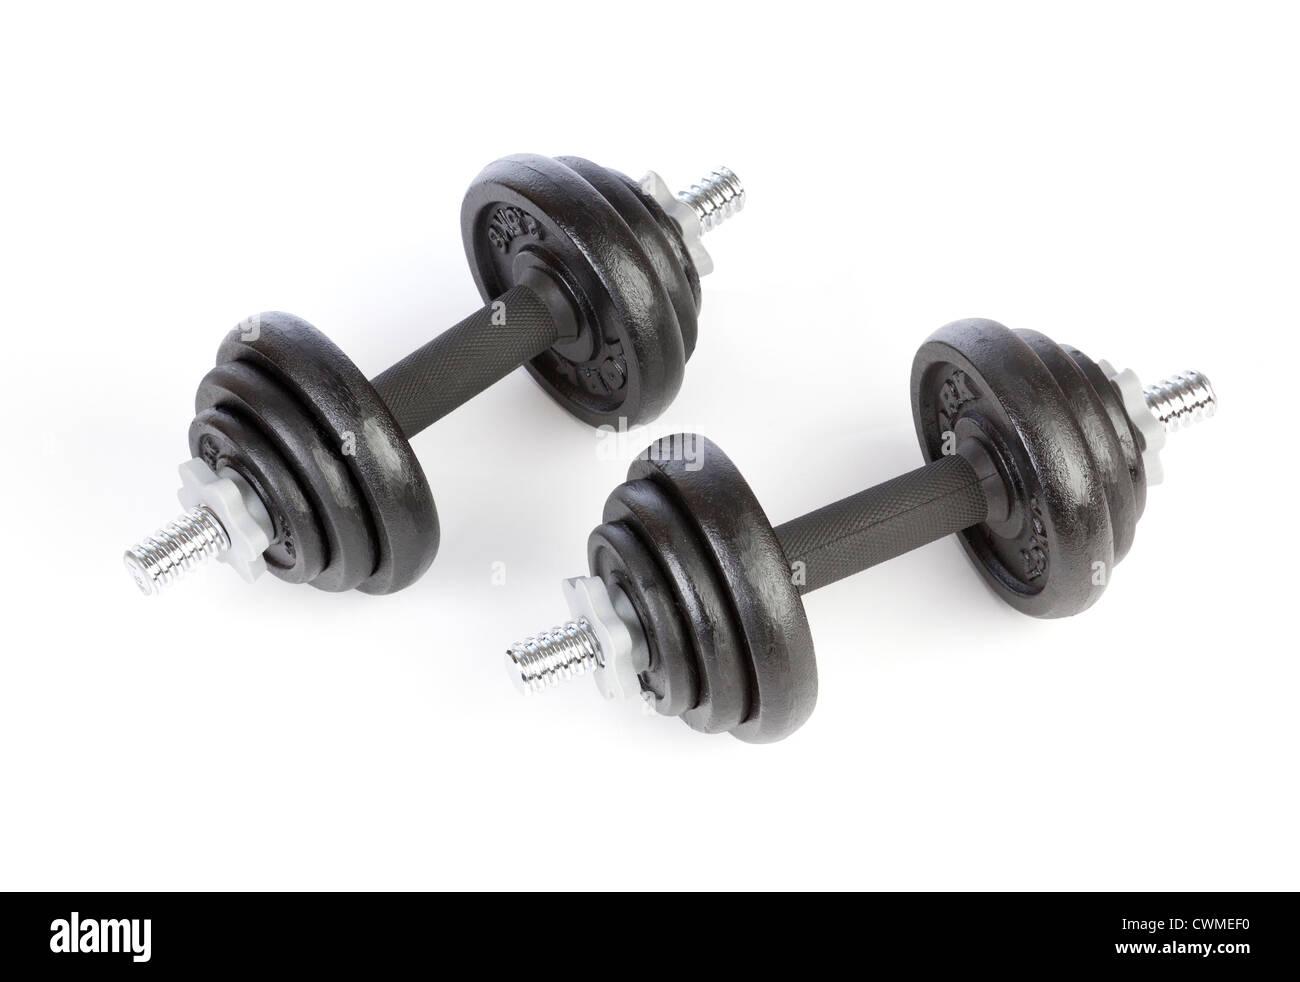 Pesa pesas de hierro fundido Foto de stock